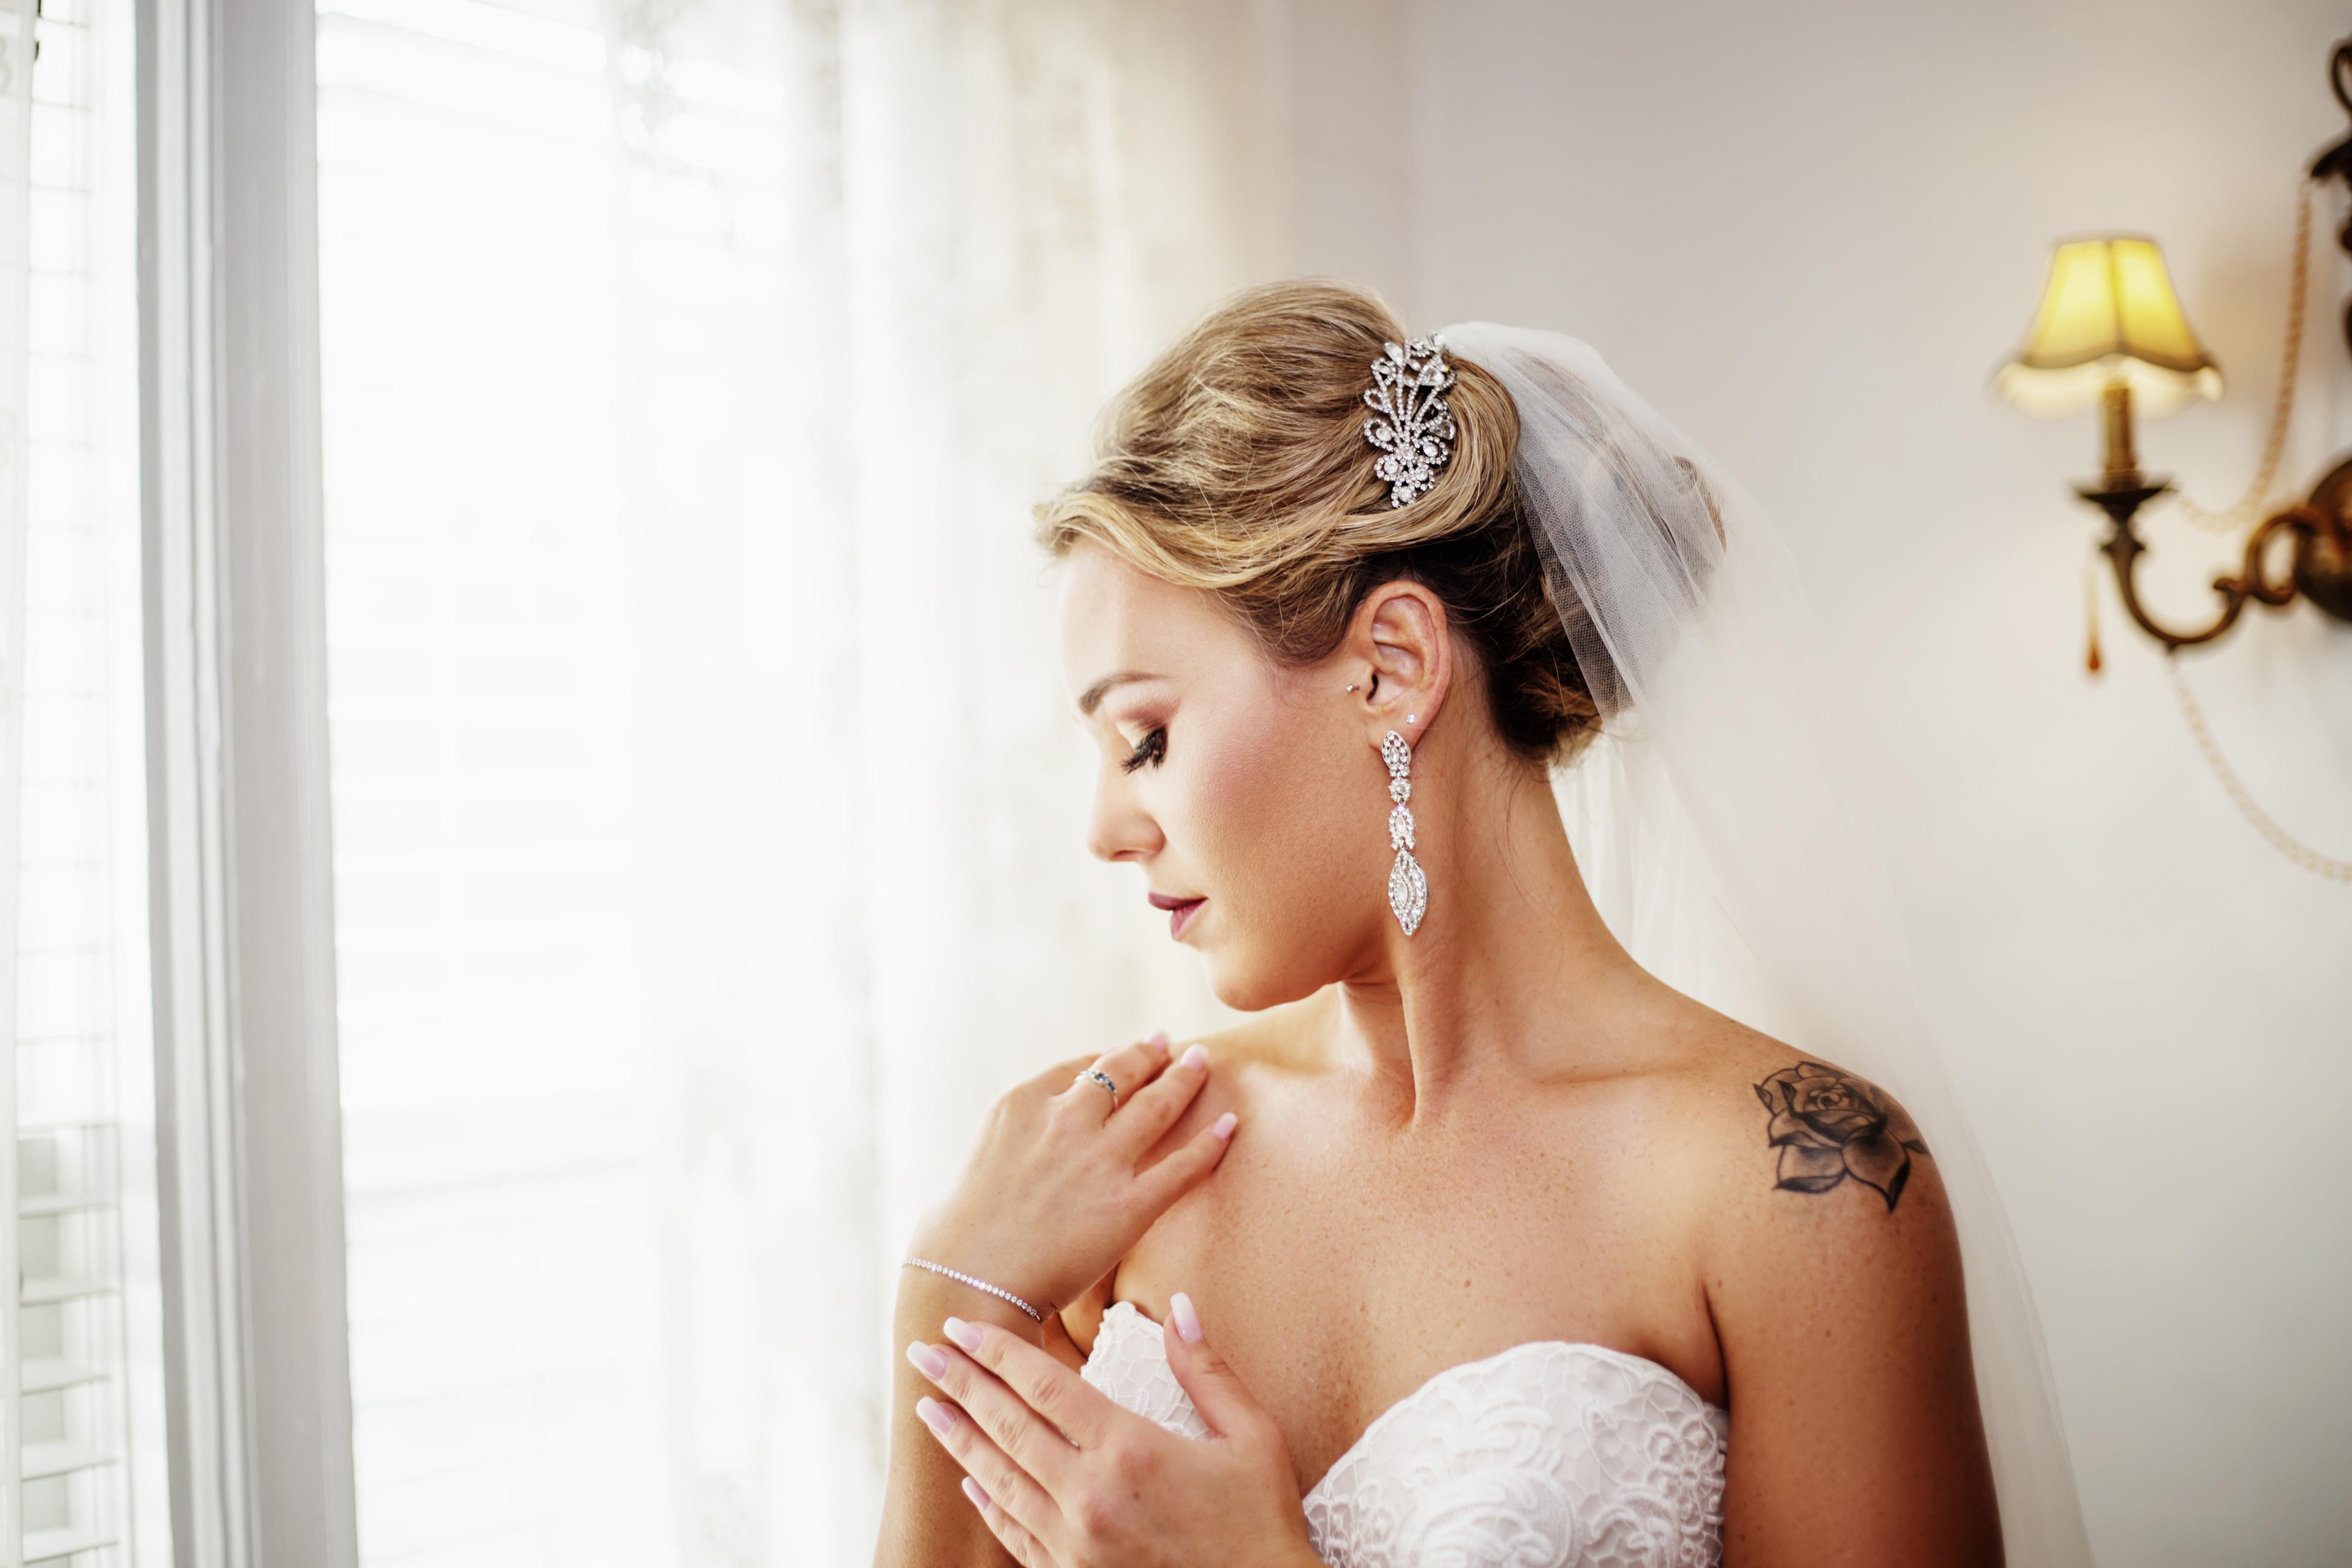 rahimisaidan | photography - Brides